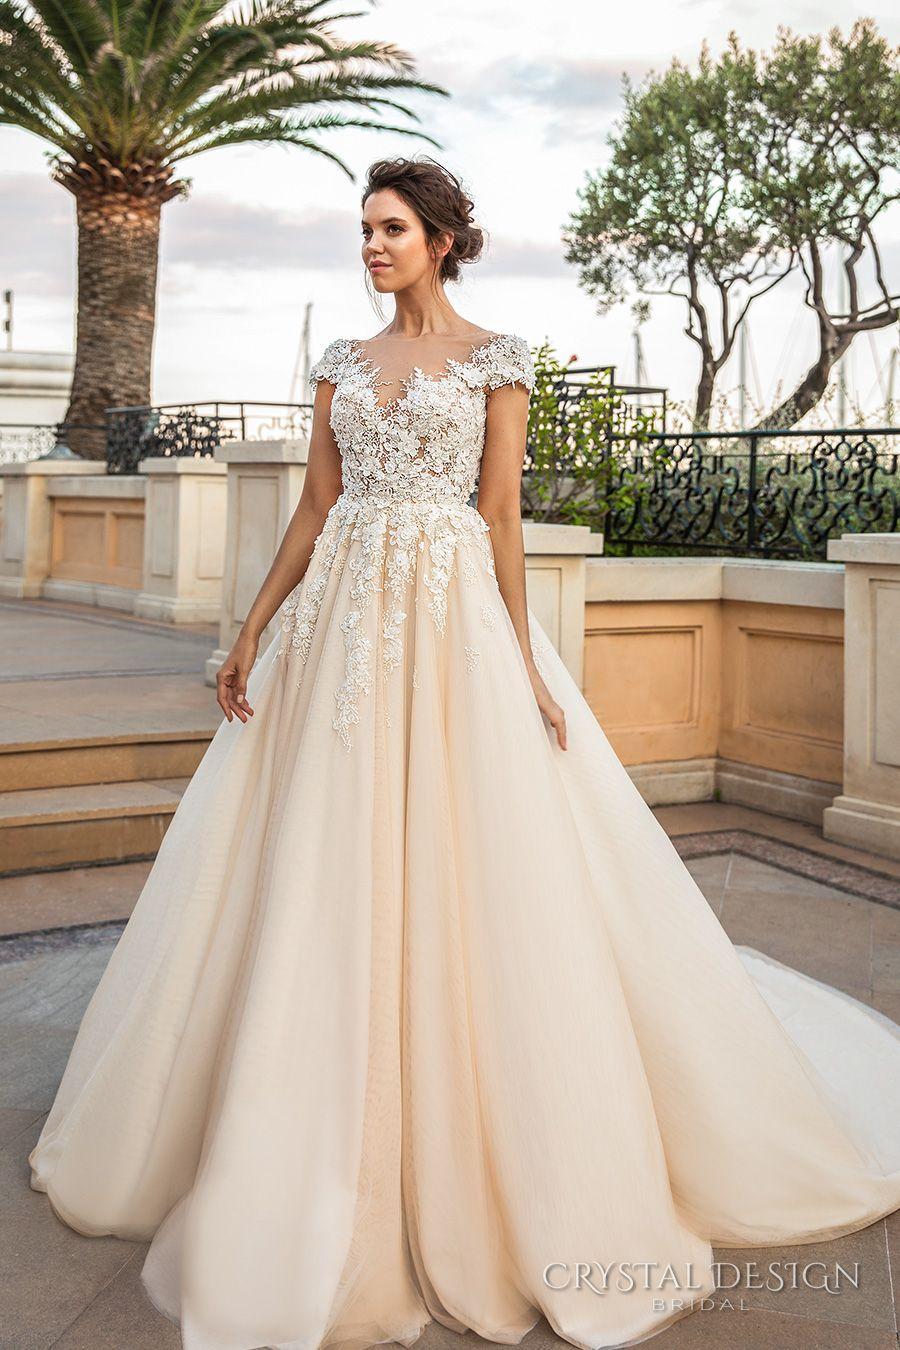 Different color wedding dresses  Crystal Design  Wedding Dresses u Haute Couture Bridal